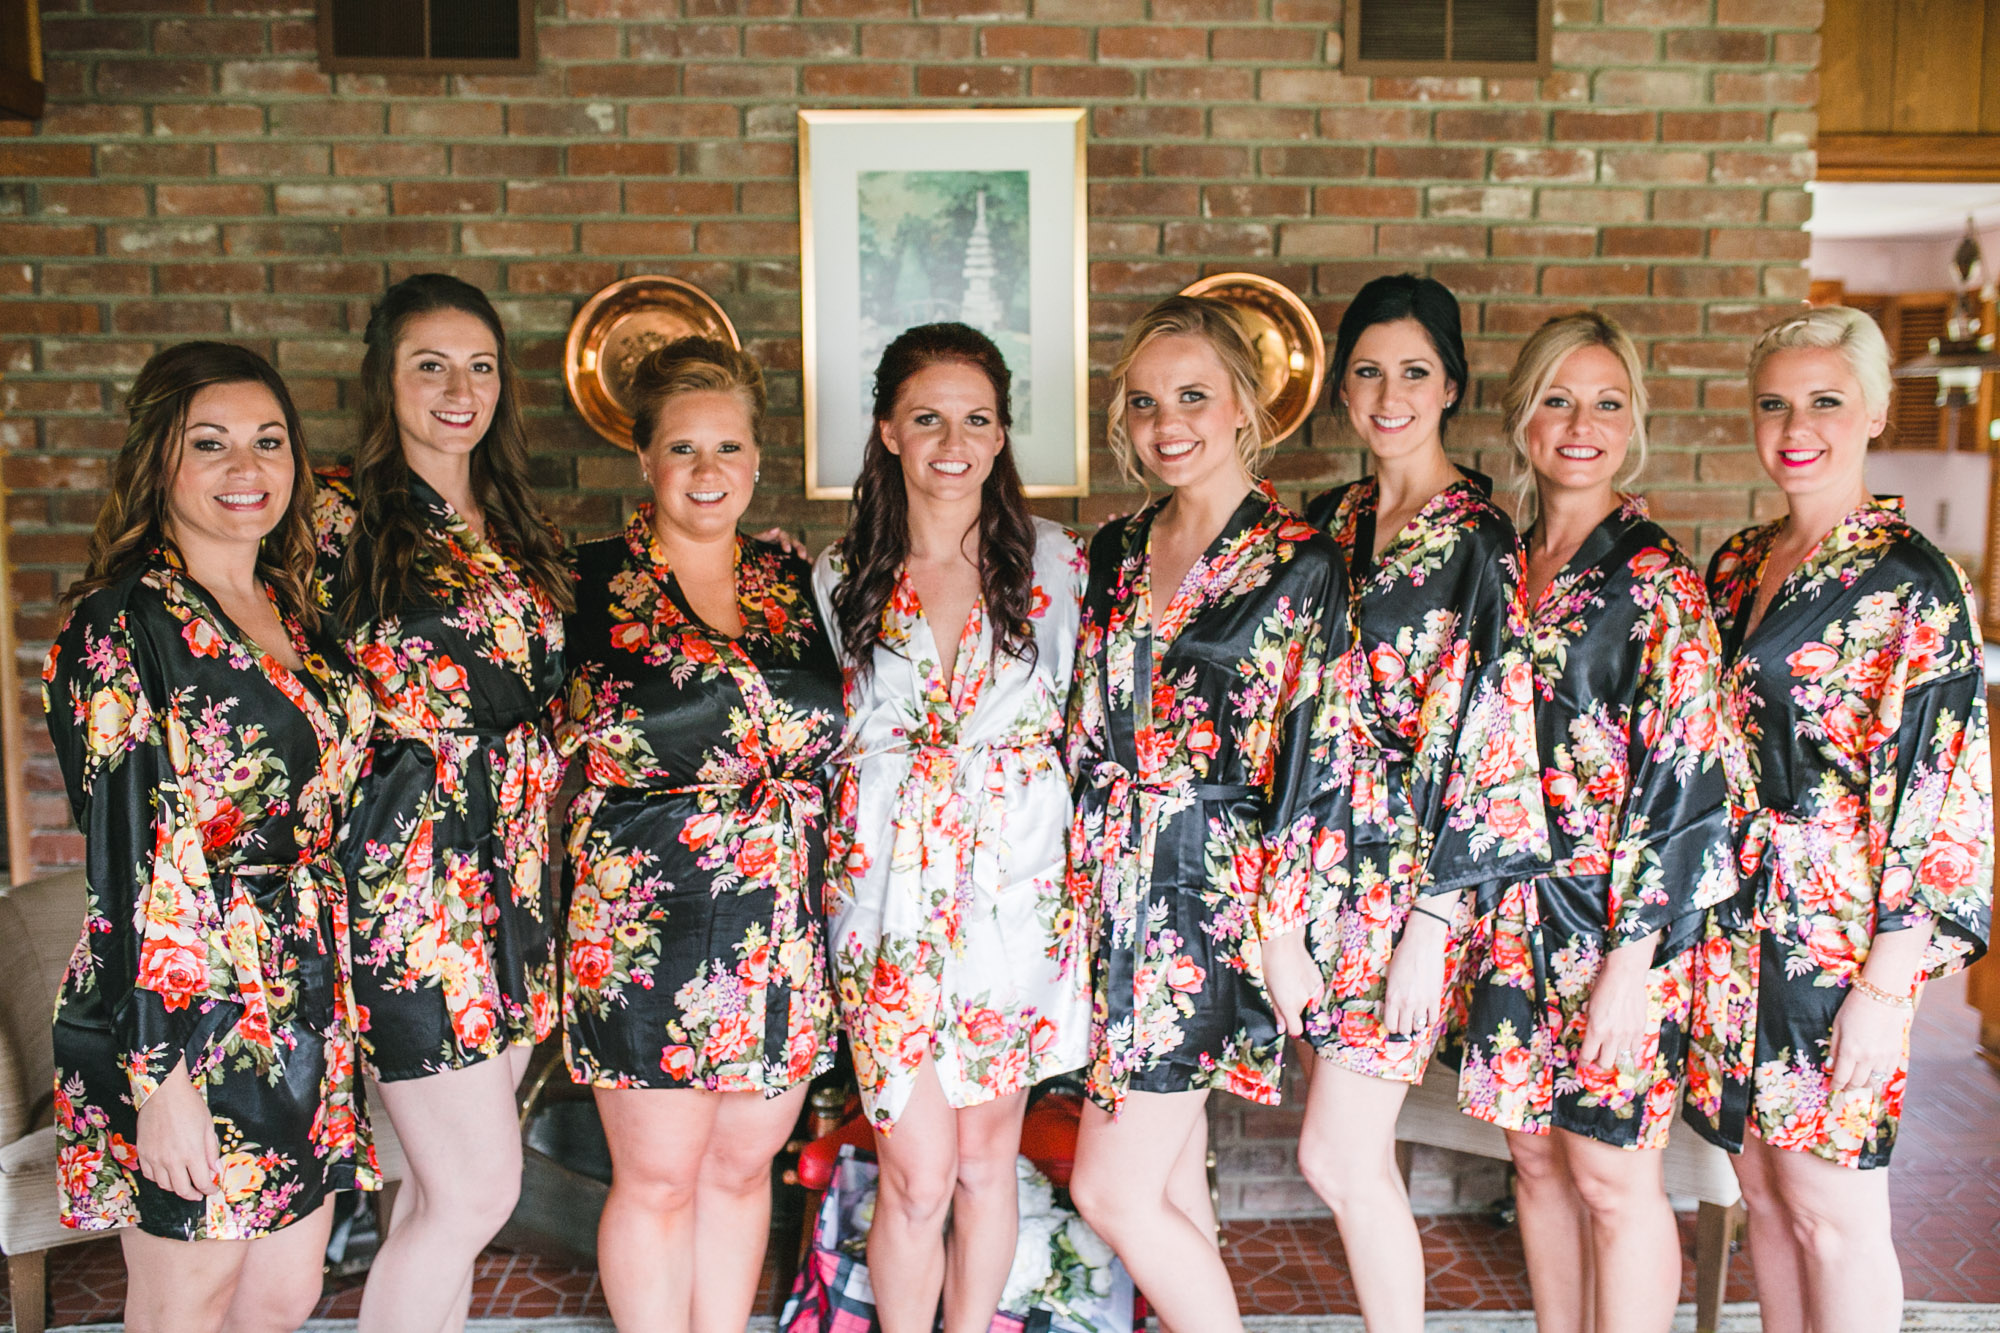 hensville-armory-wedding (2 of 8).jpg